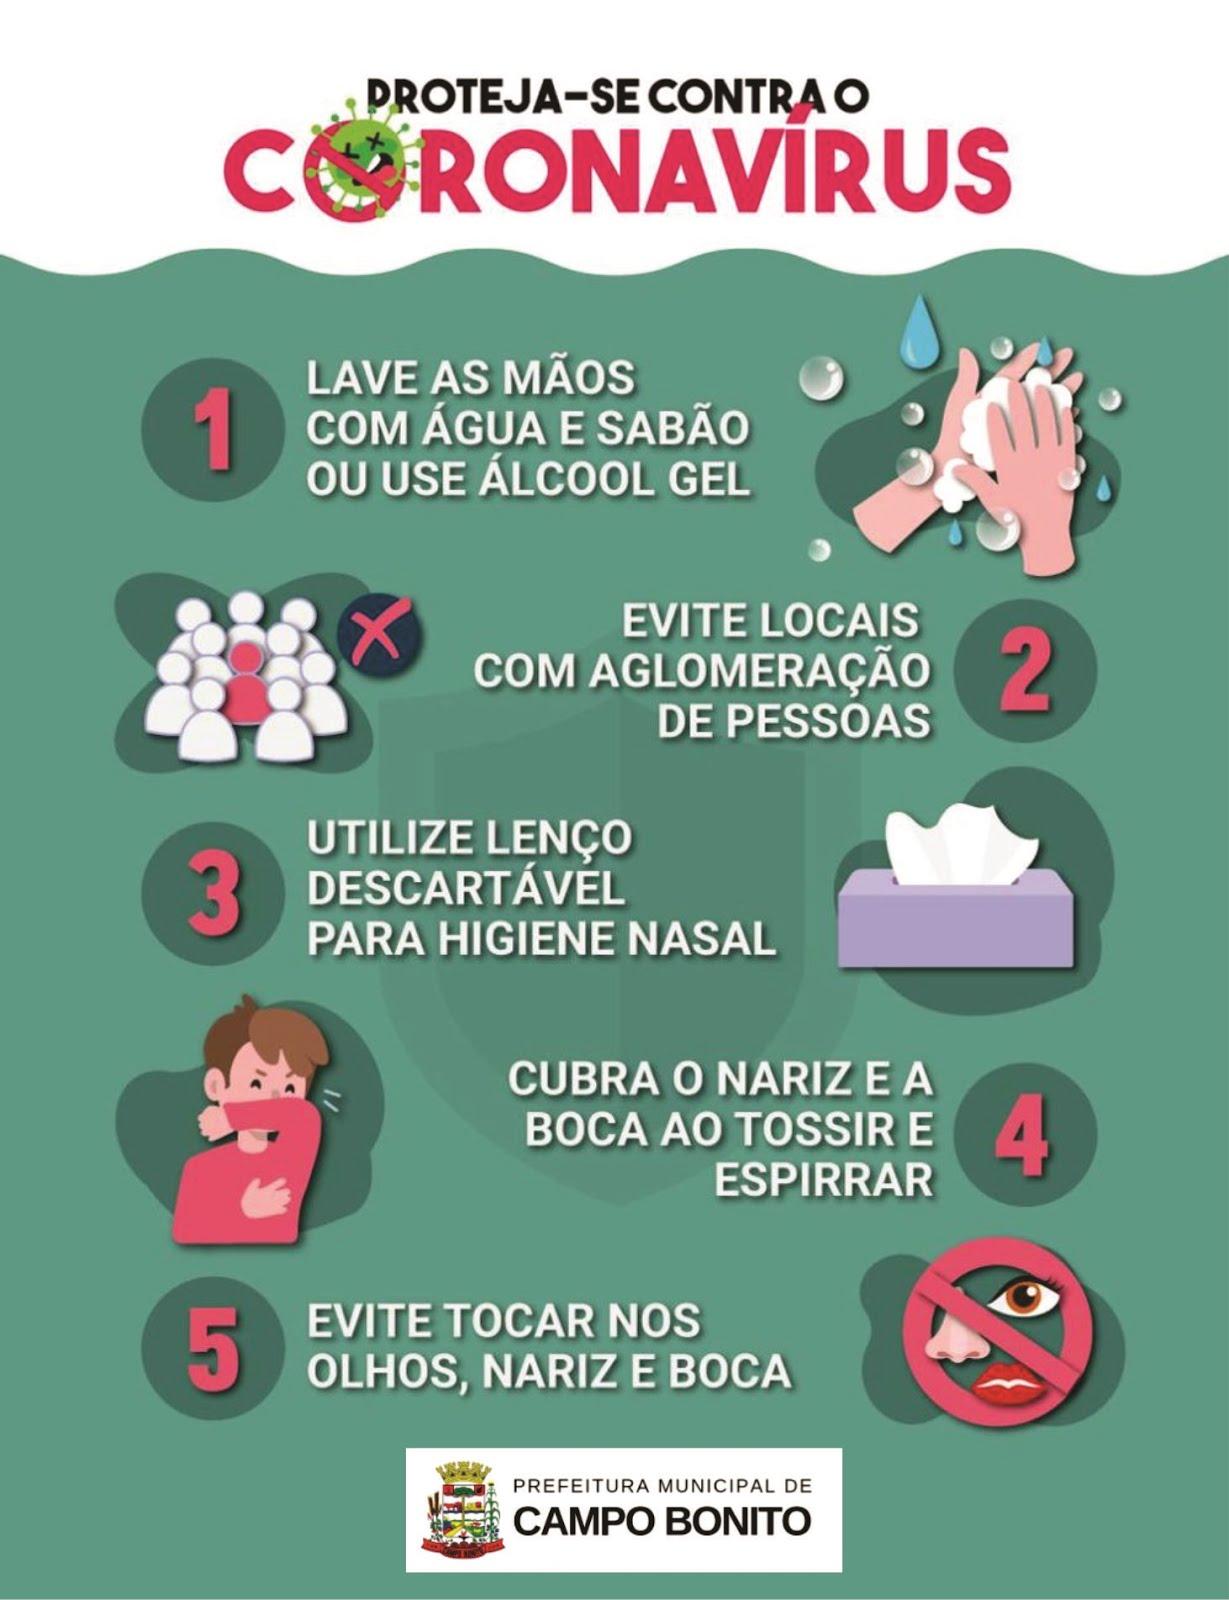 Prefeitura Campo Bonito no Combate ao Coronavírus